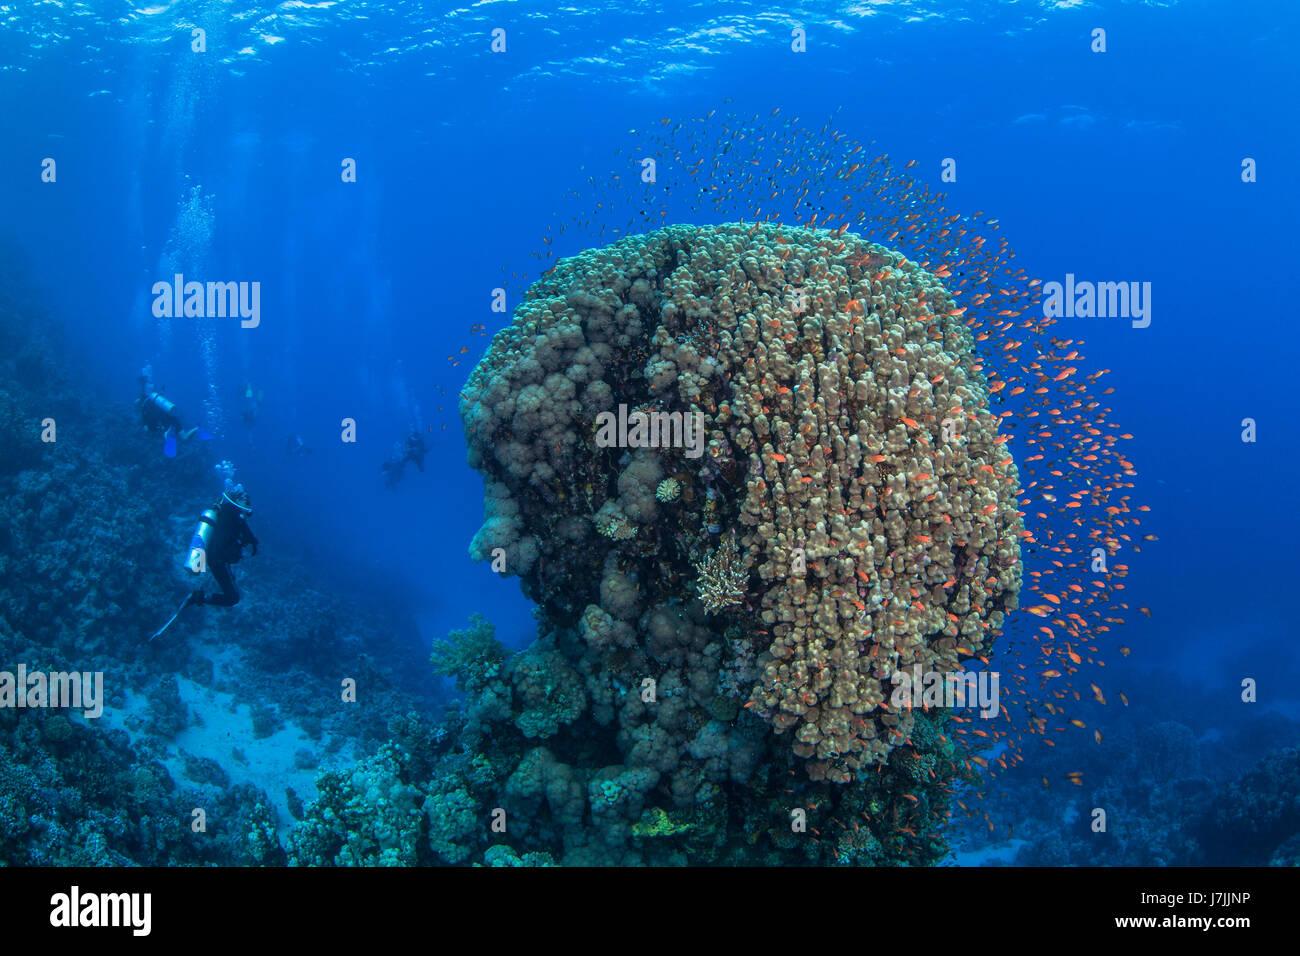 Scuba Diver relojes coloridos peces forma halo alrededor de coral como compañero domo buzos explorar arrecifes agua azul de fondo. Mar Rojo, Egipto Foto de stock